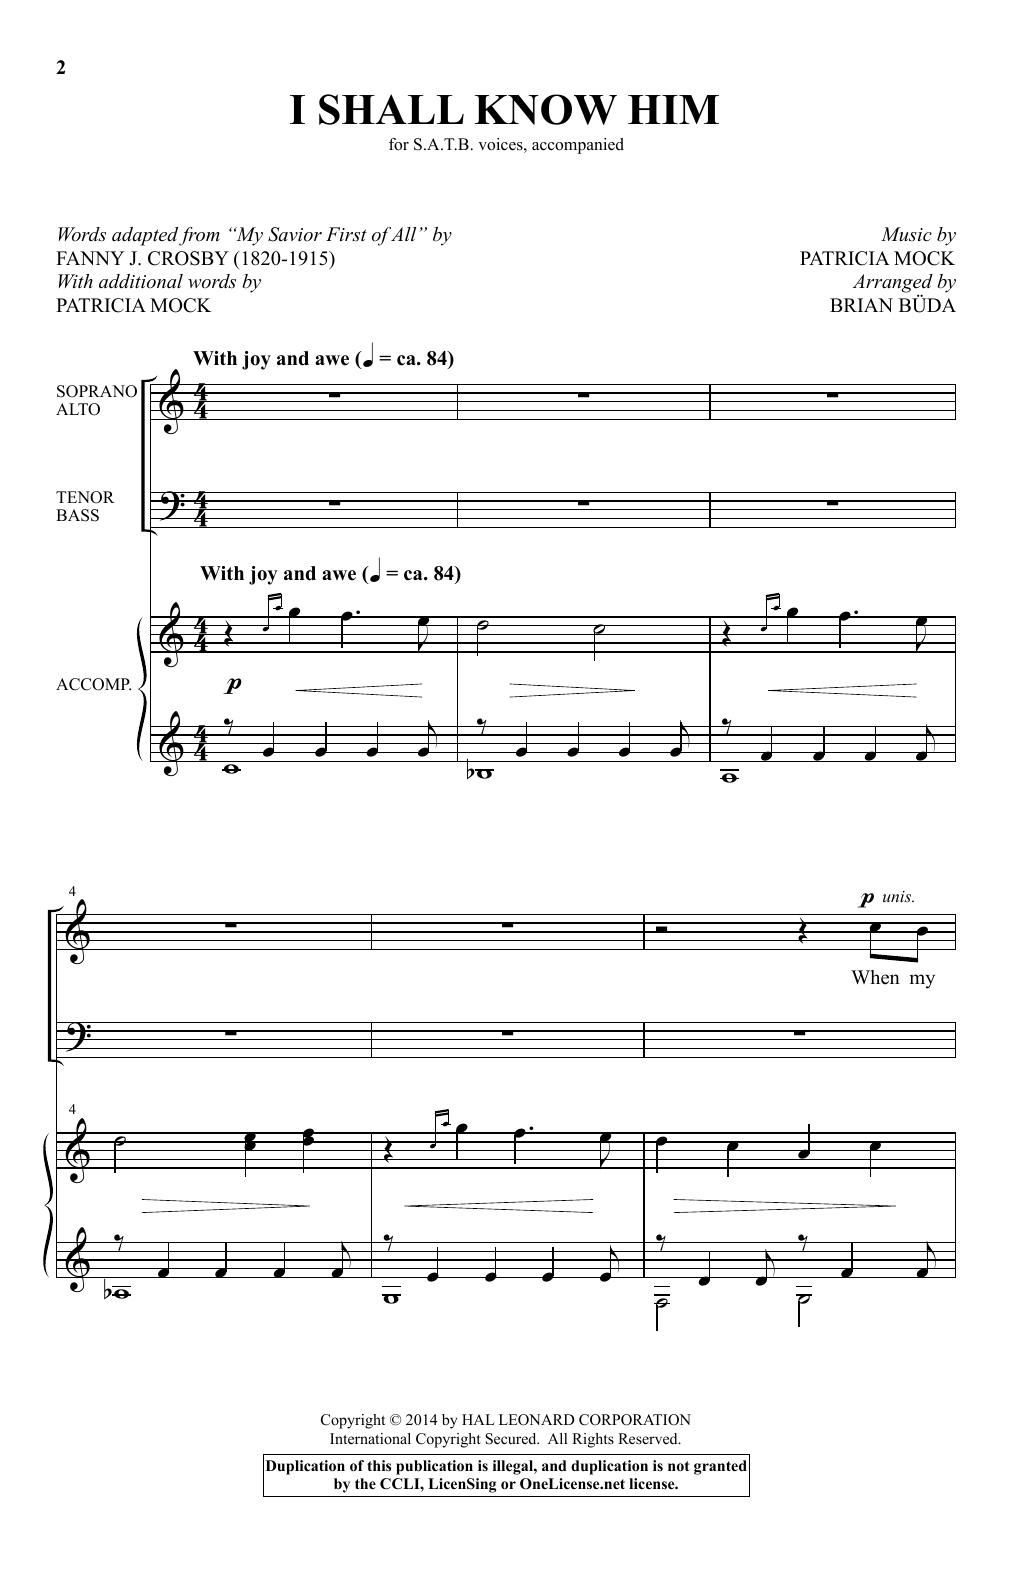 Brian Buda I Shall Know Him sheet music notes and chords. Download Printable PDF.